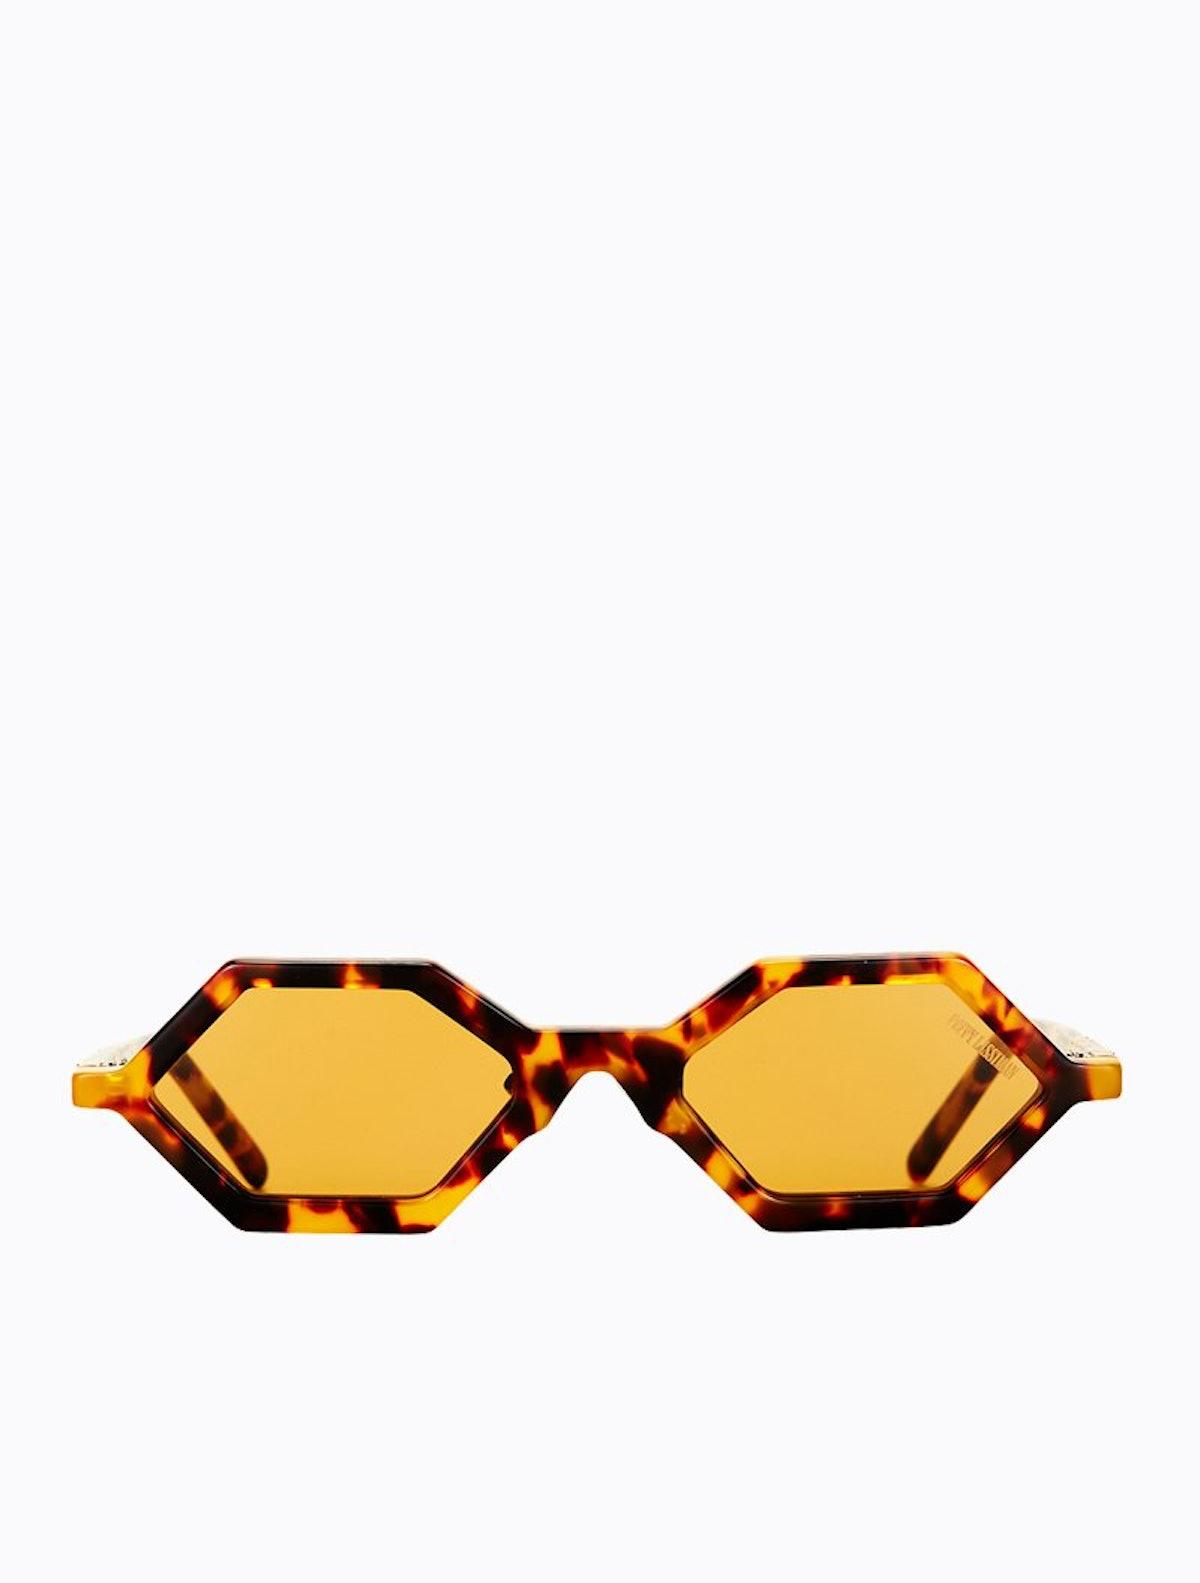 Drazic Torti Sunglasses